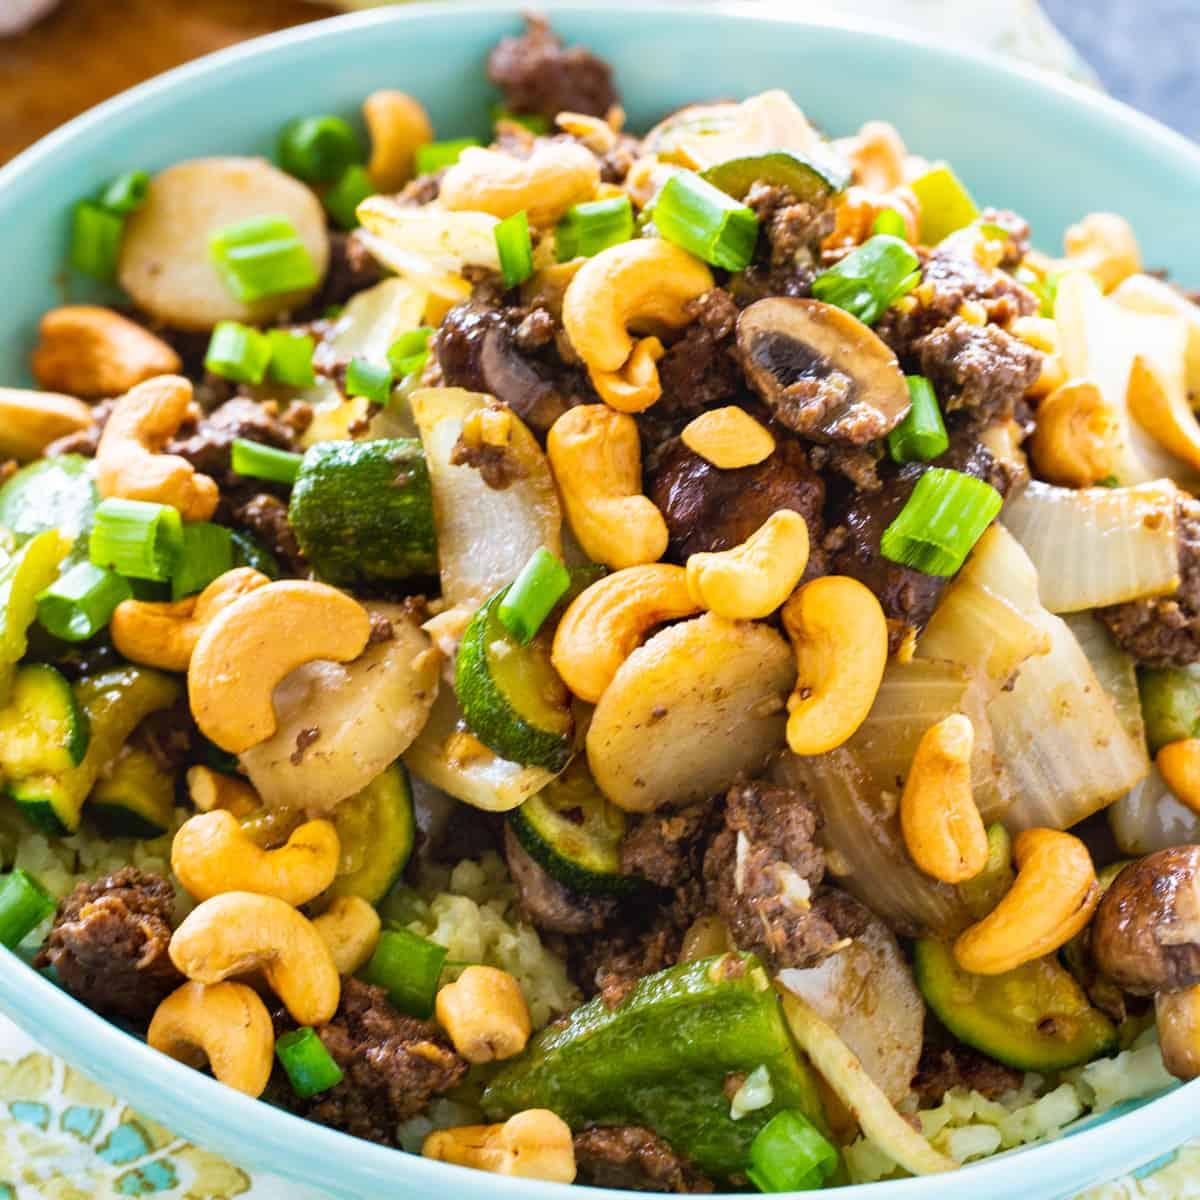 Keto Cashew Beef in a light blue bowl.